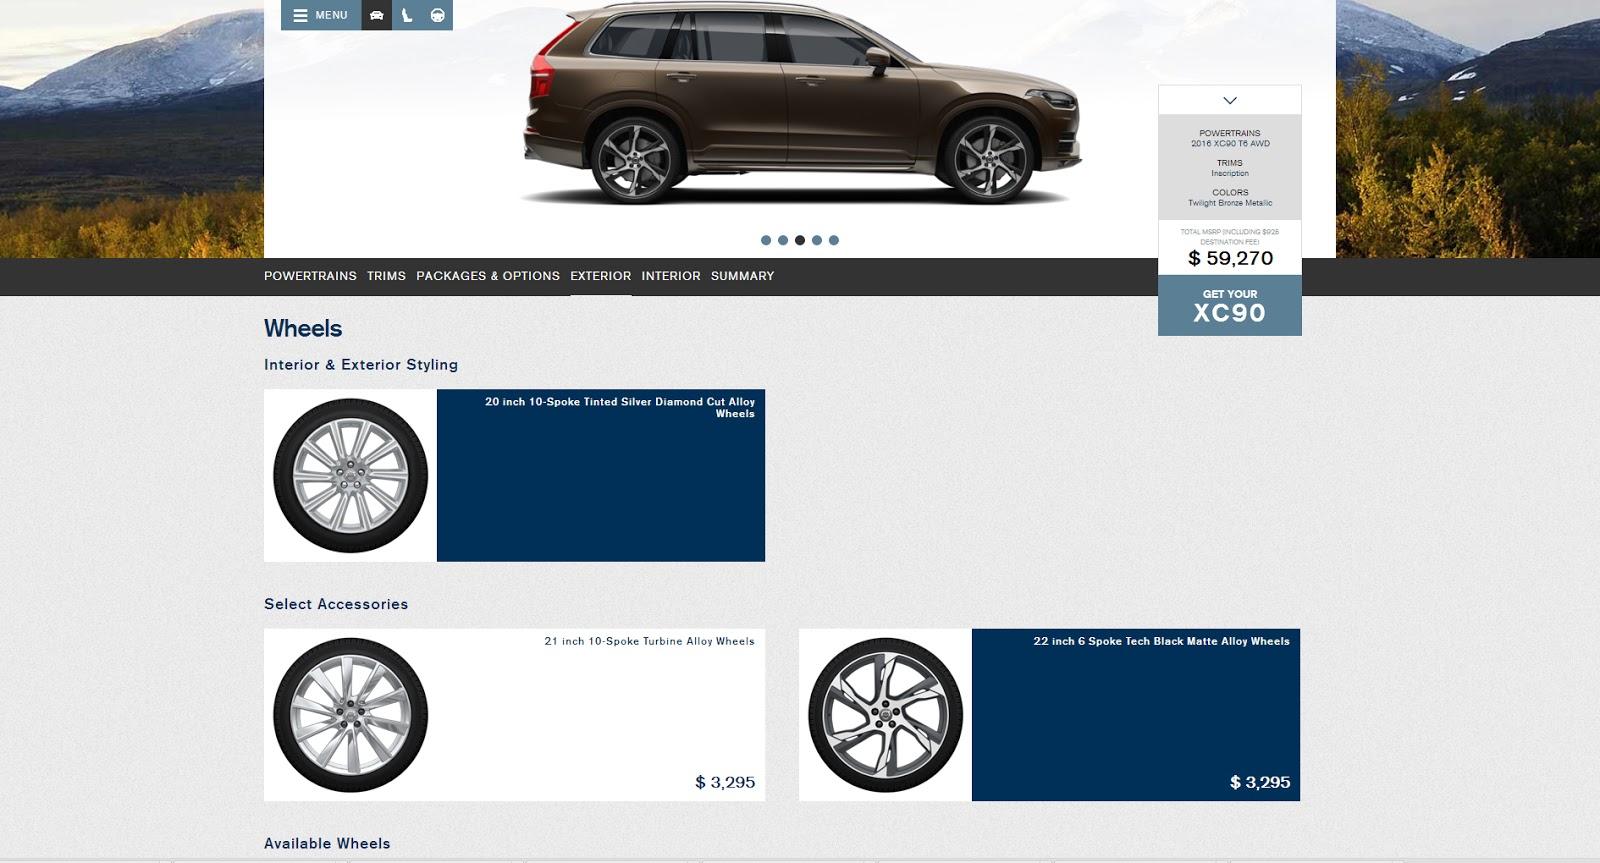 Build the 2016 Volvo XC90 of Your Dreams Via Configurator